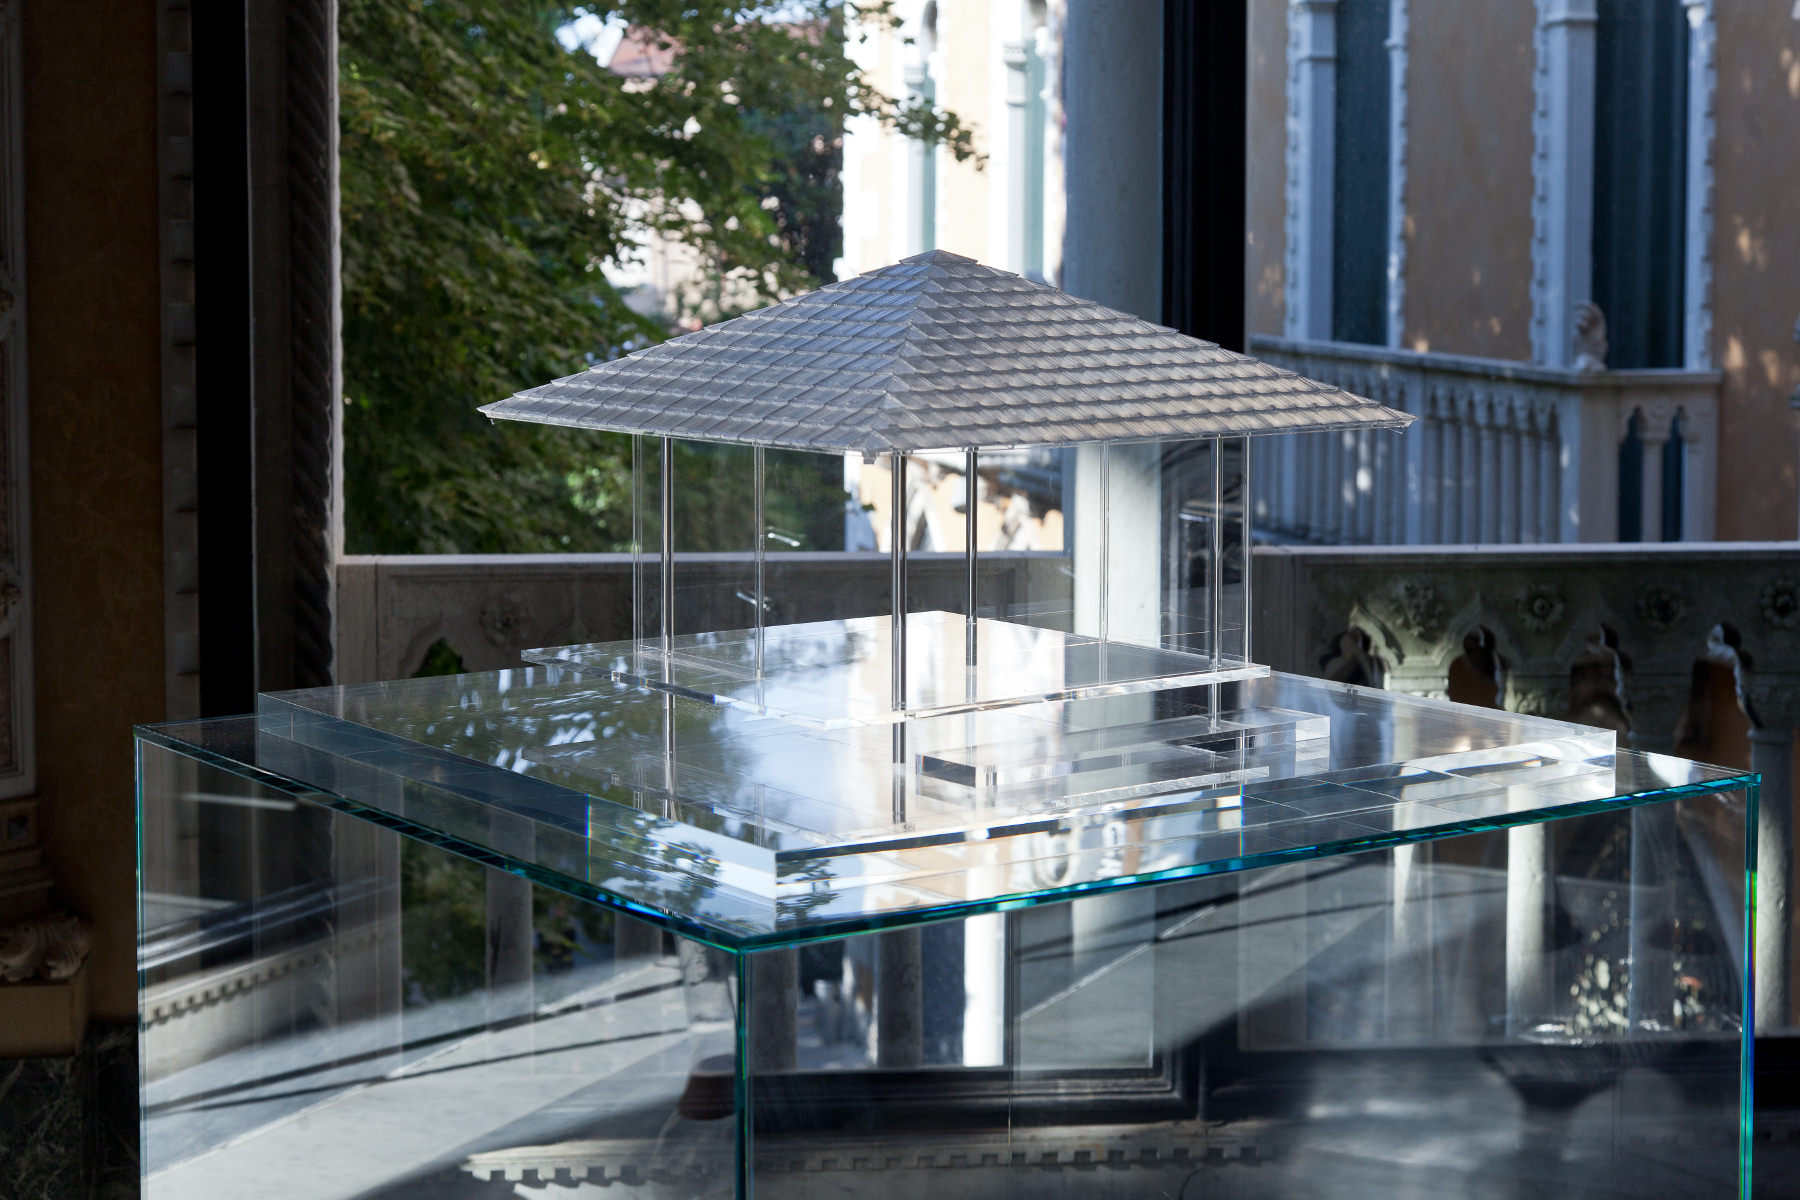 Tokujin Yoshioka - The Glass Tea House